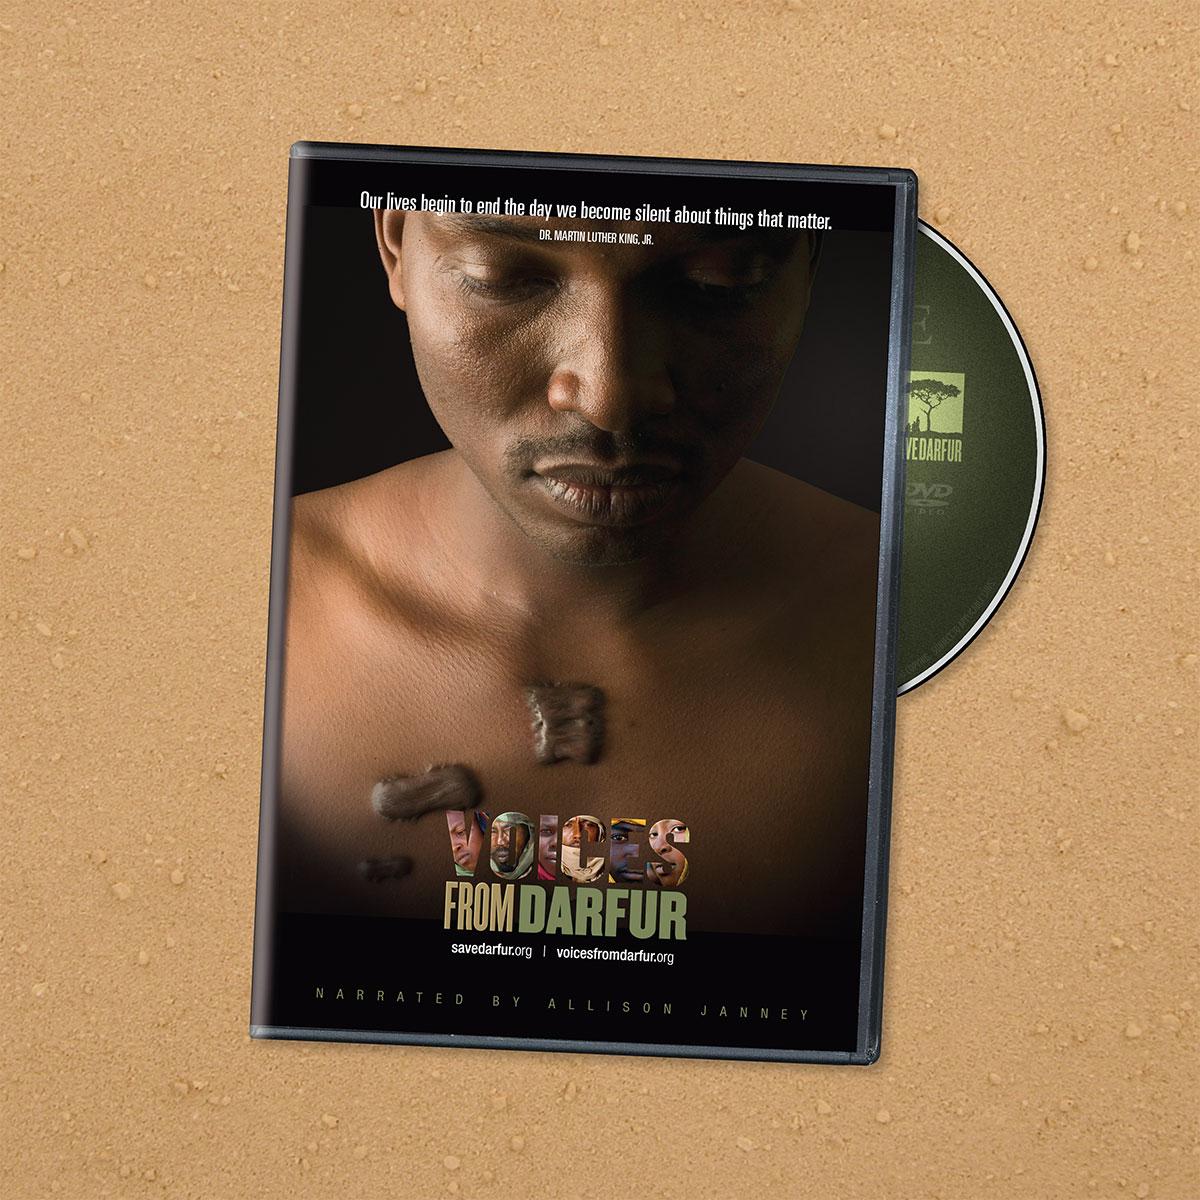 Voices From Darfur DVD.jpg